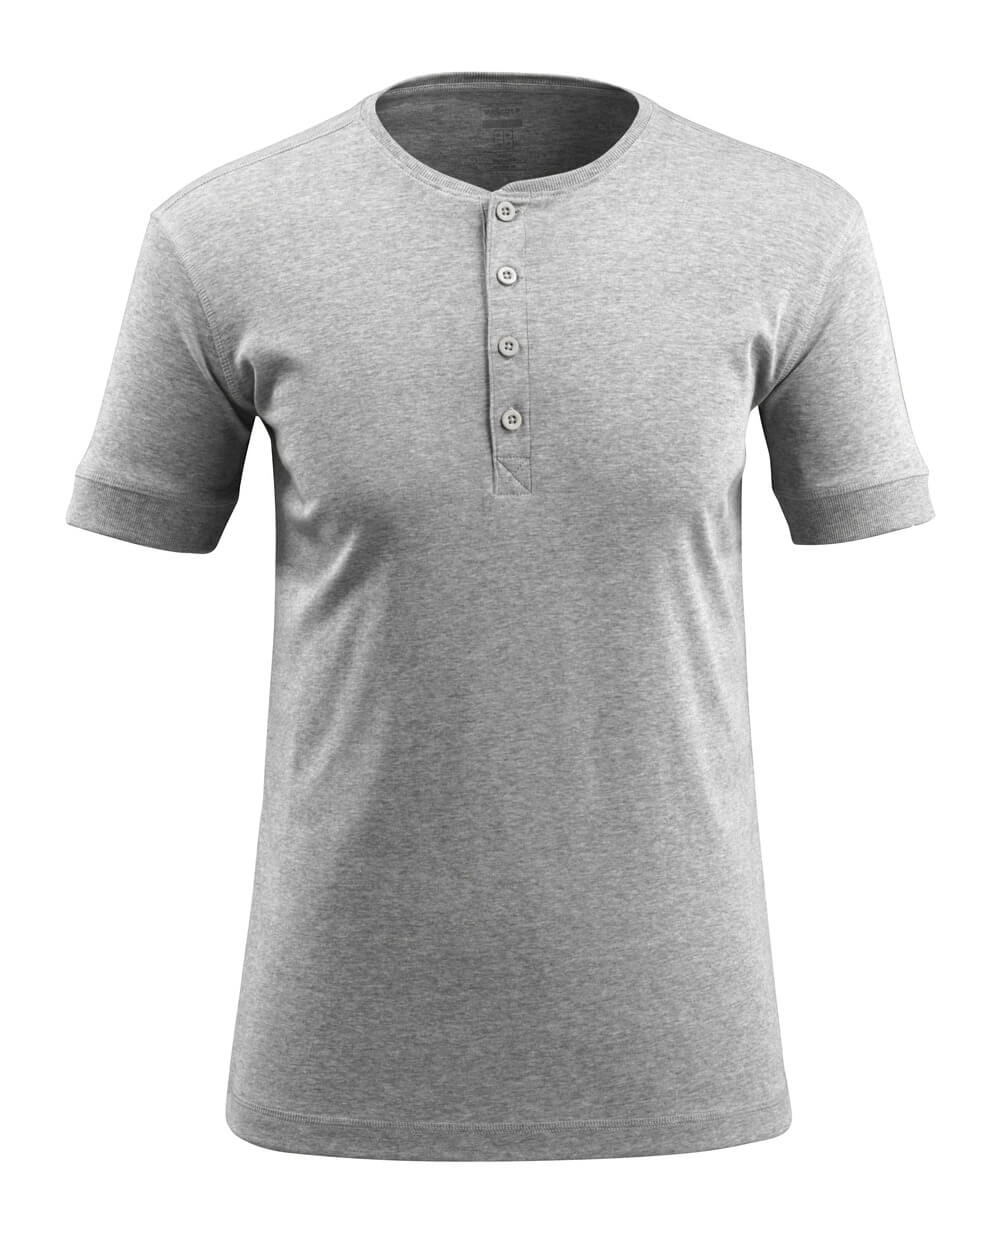 50582-964-08 T-shirt - grey-flecked